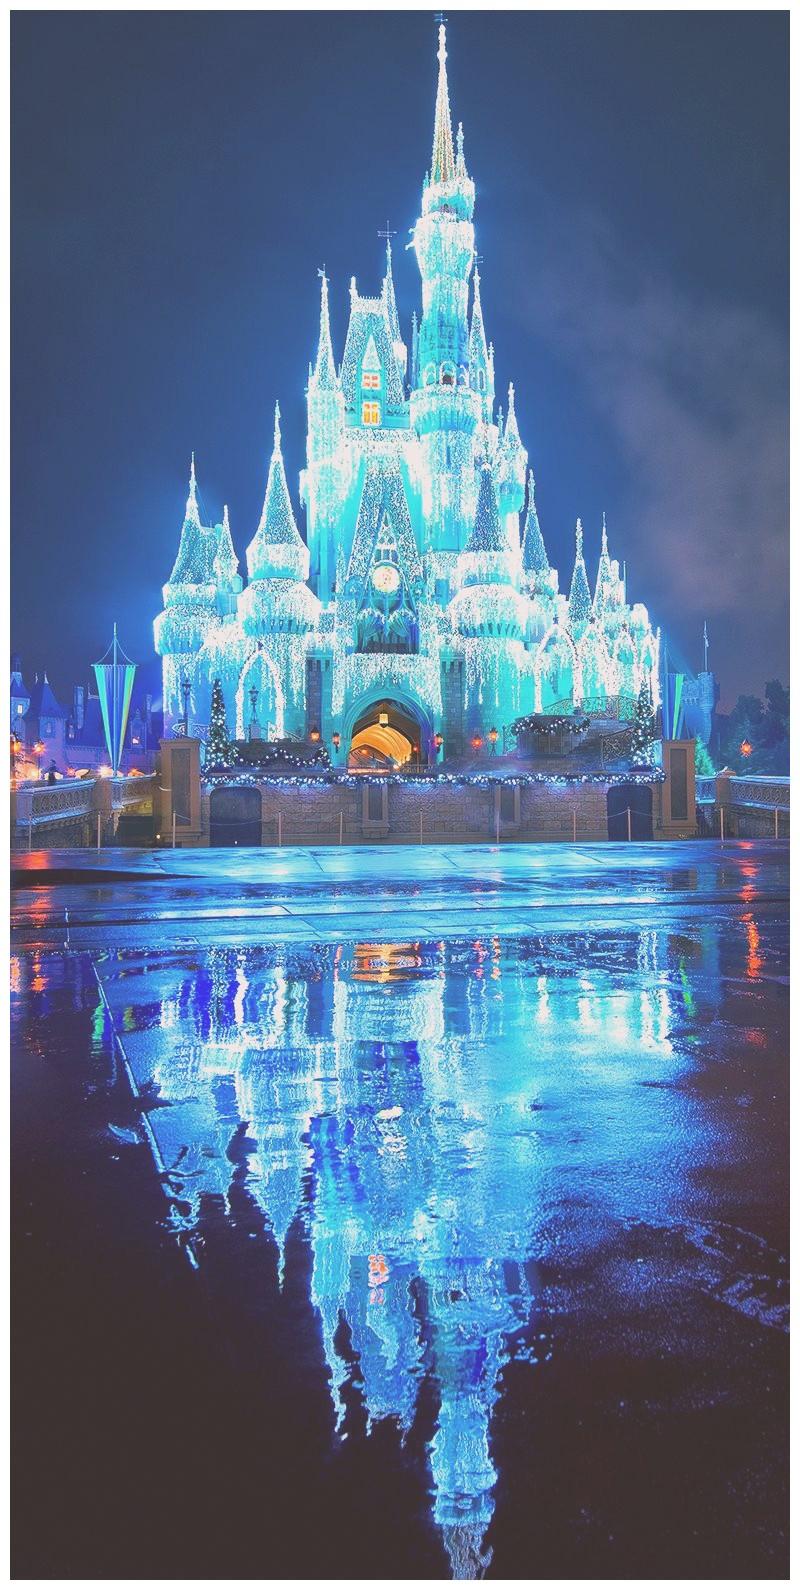 Disney World Iphone Wallpaper Hd Disney World Cinderella Castle 1341571 Hd Wallpaper Backgrounds Download